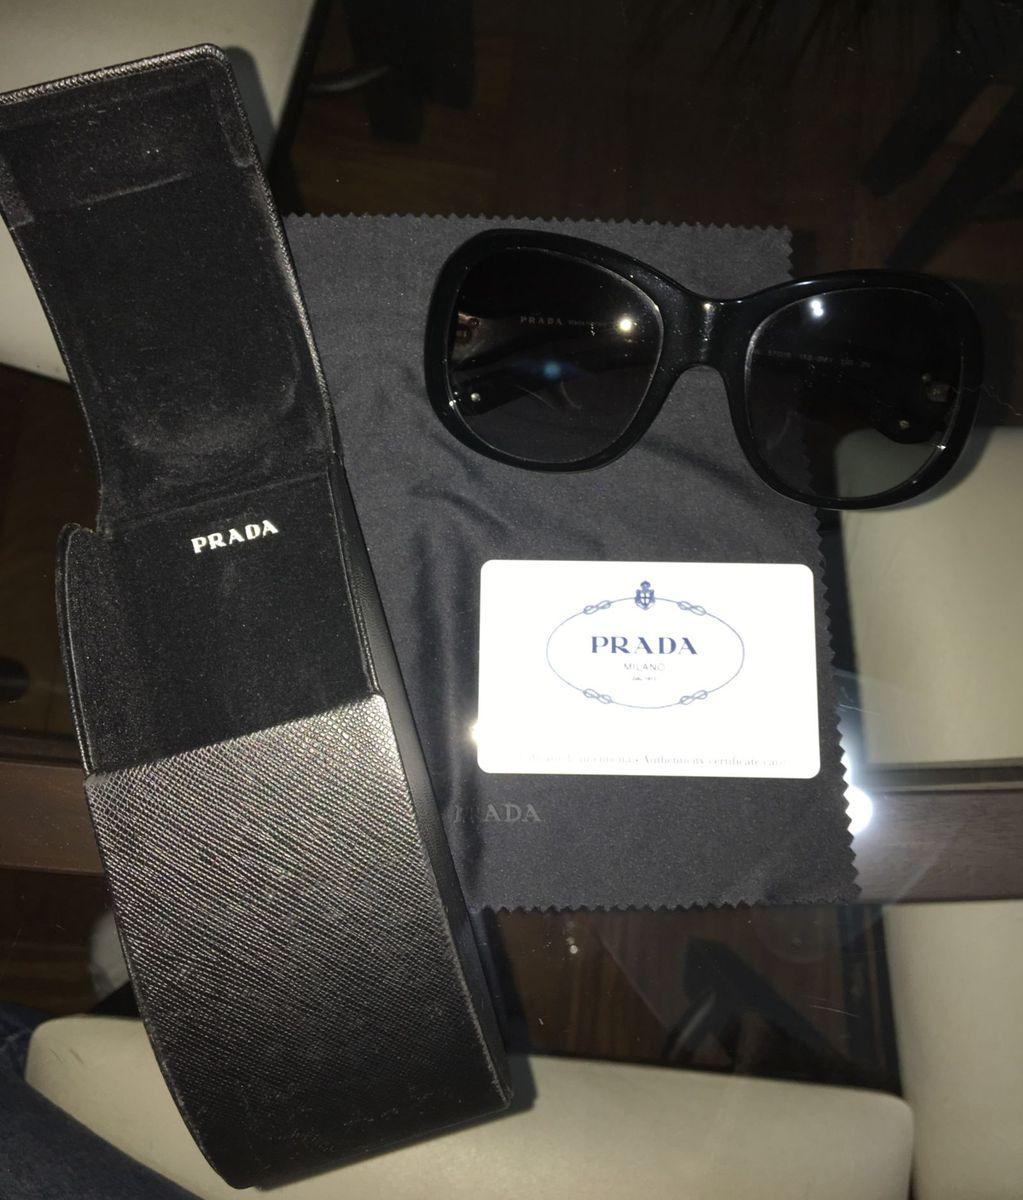 f8ba92498b814 óculos prada original - óculos prada.  Czm6ly9wag90b3muzw5qb2vplmnvbs5ici9wcm9kdwn0cy82nzg4nzgwl2nhnmu5y2zhnti0mdjiodu5yji0zwvhytywowjmzdu4lmpwzw  ...